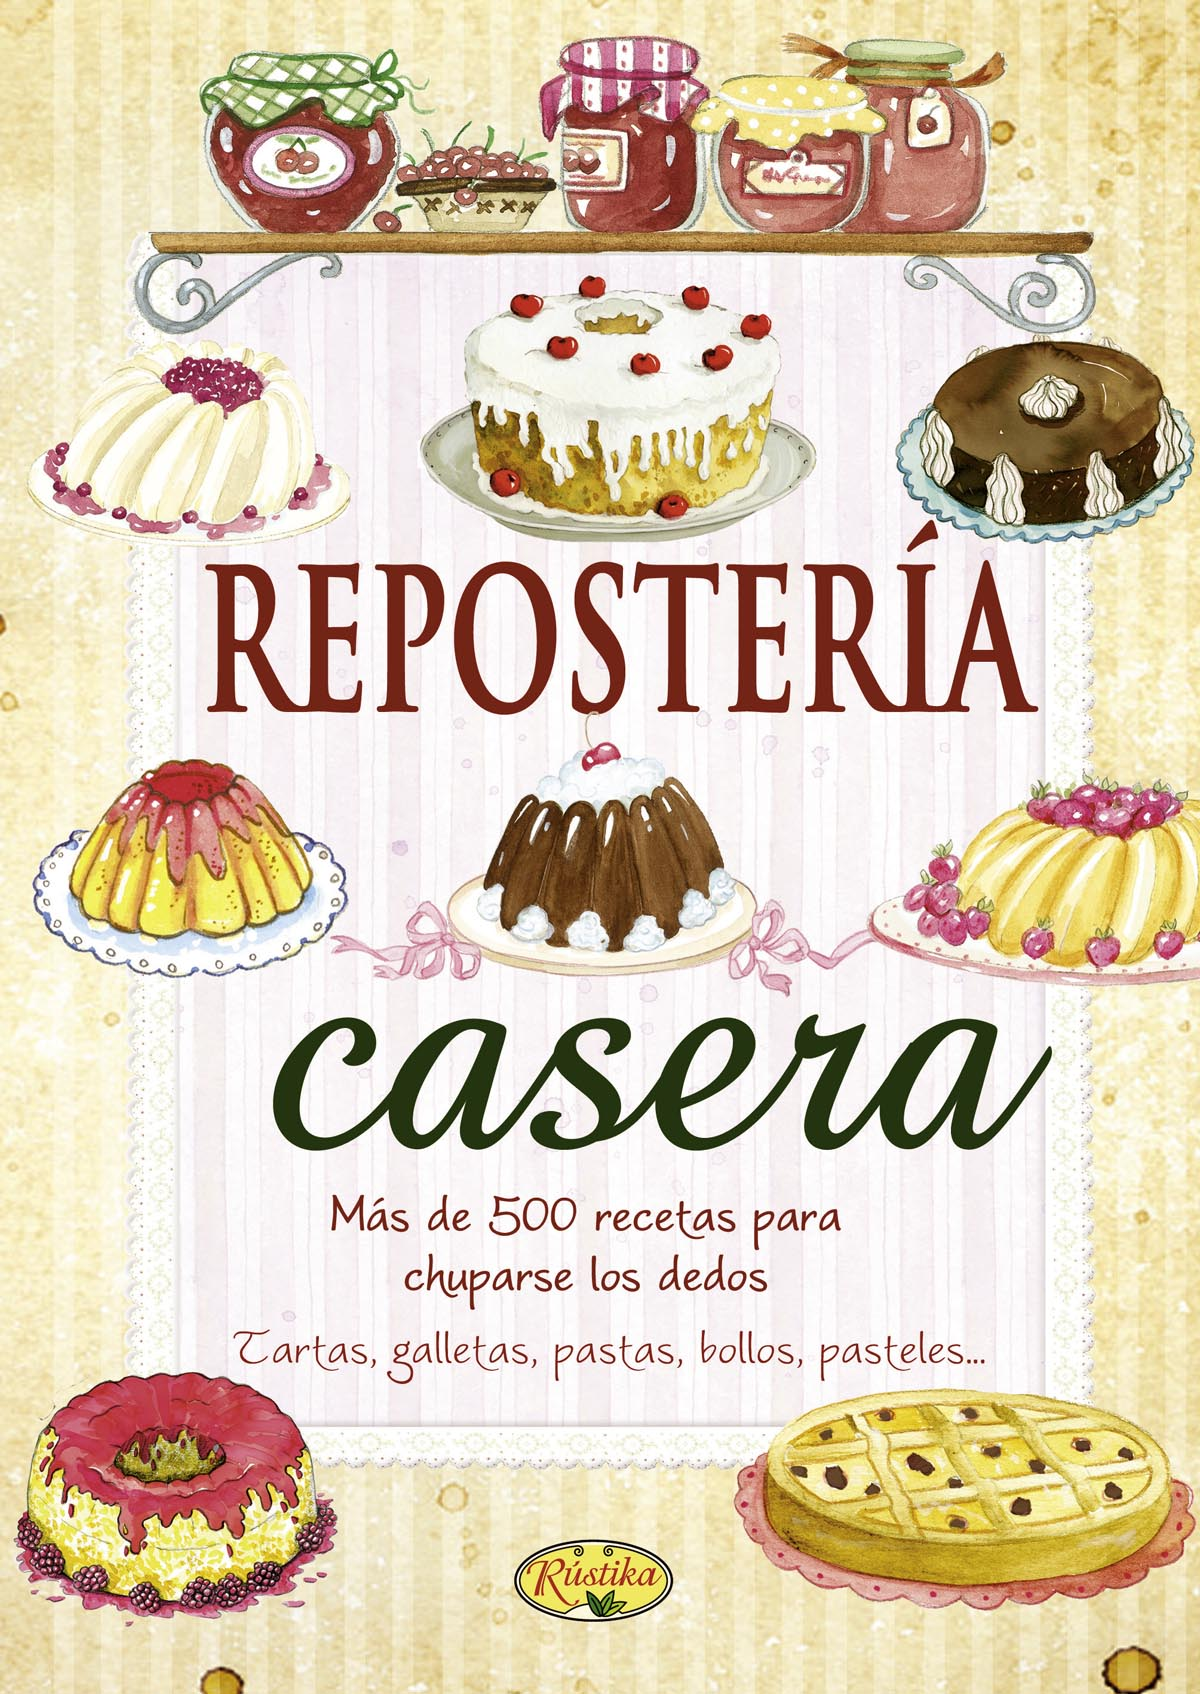 Recetas de cocina  Rustika   Todo libro  Libros